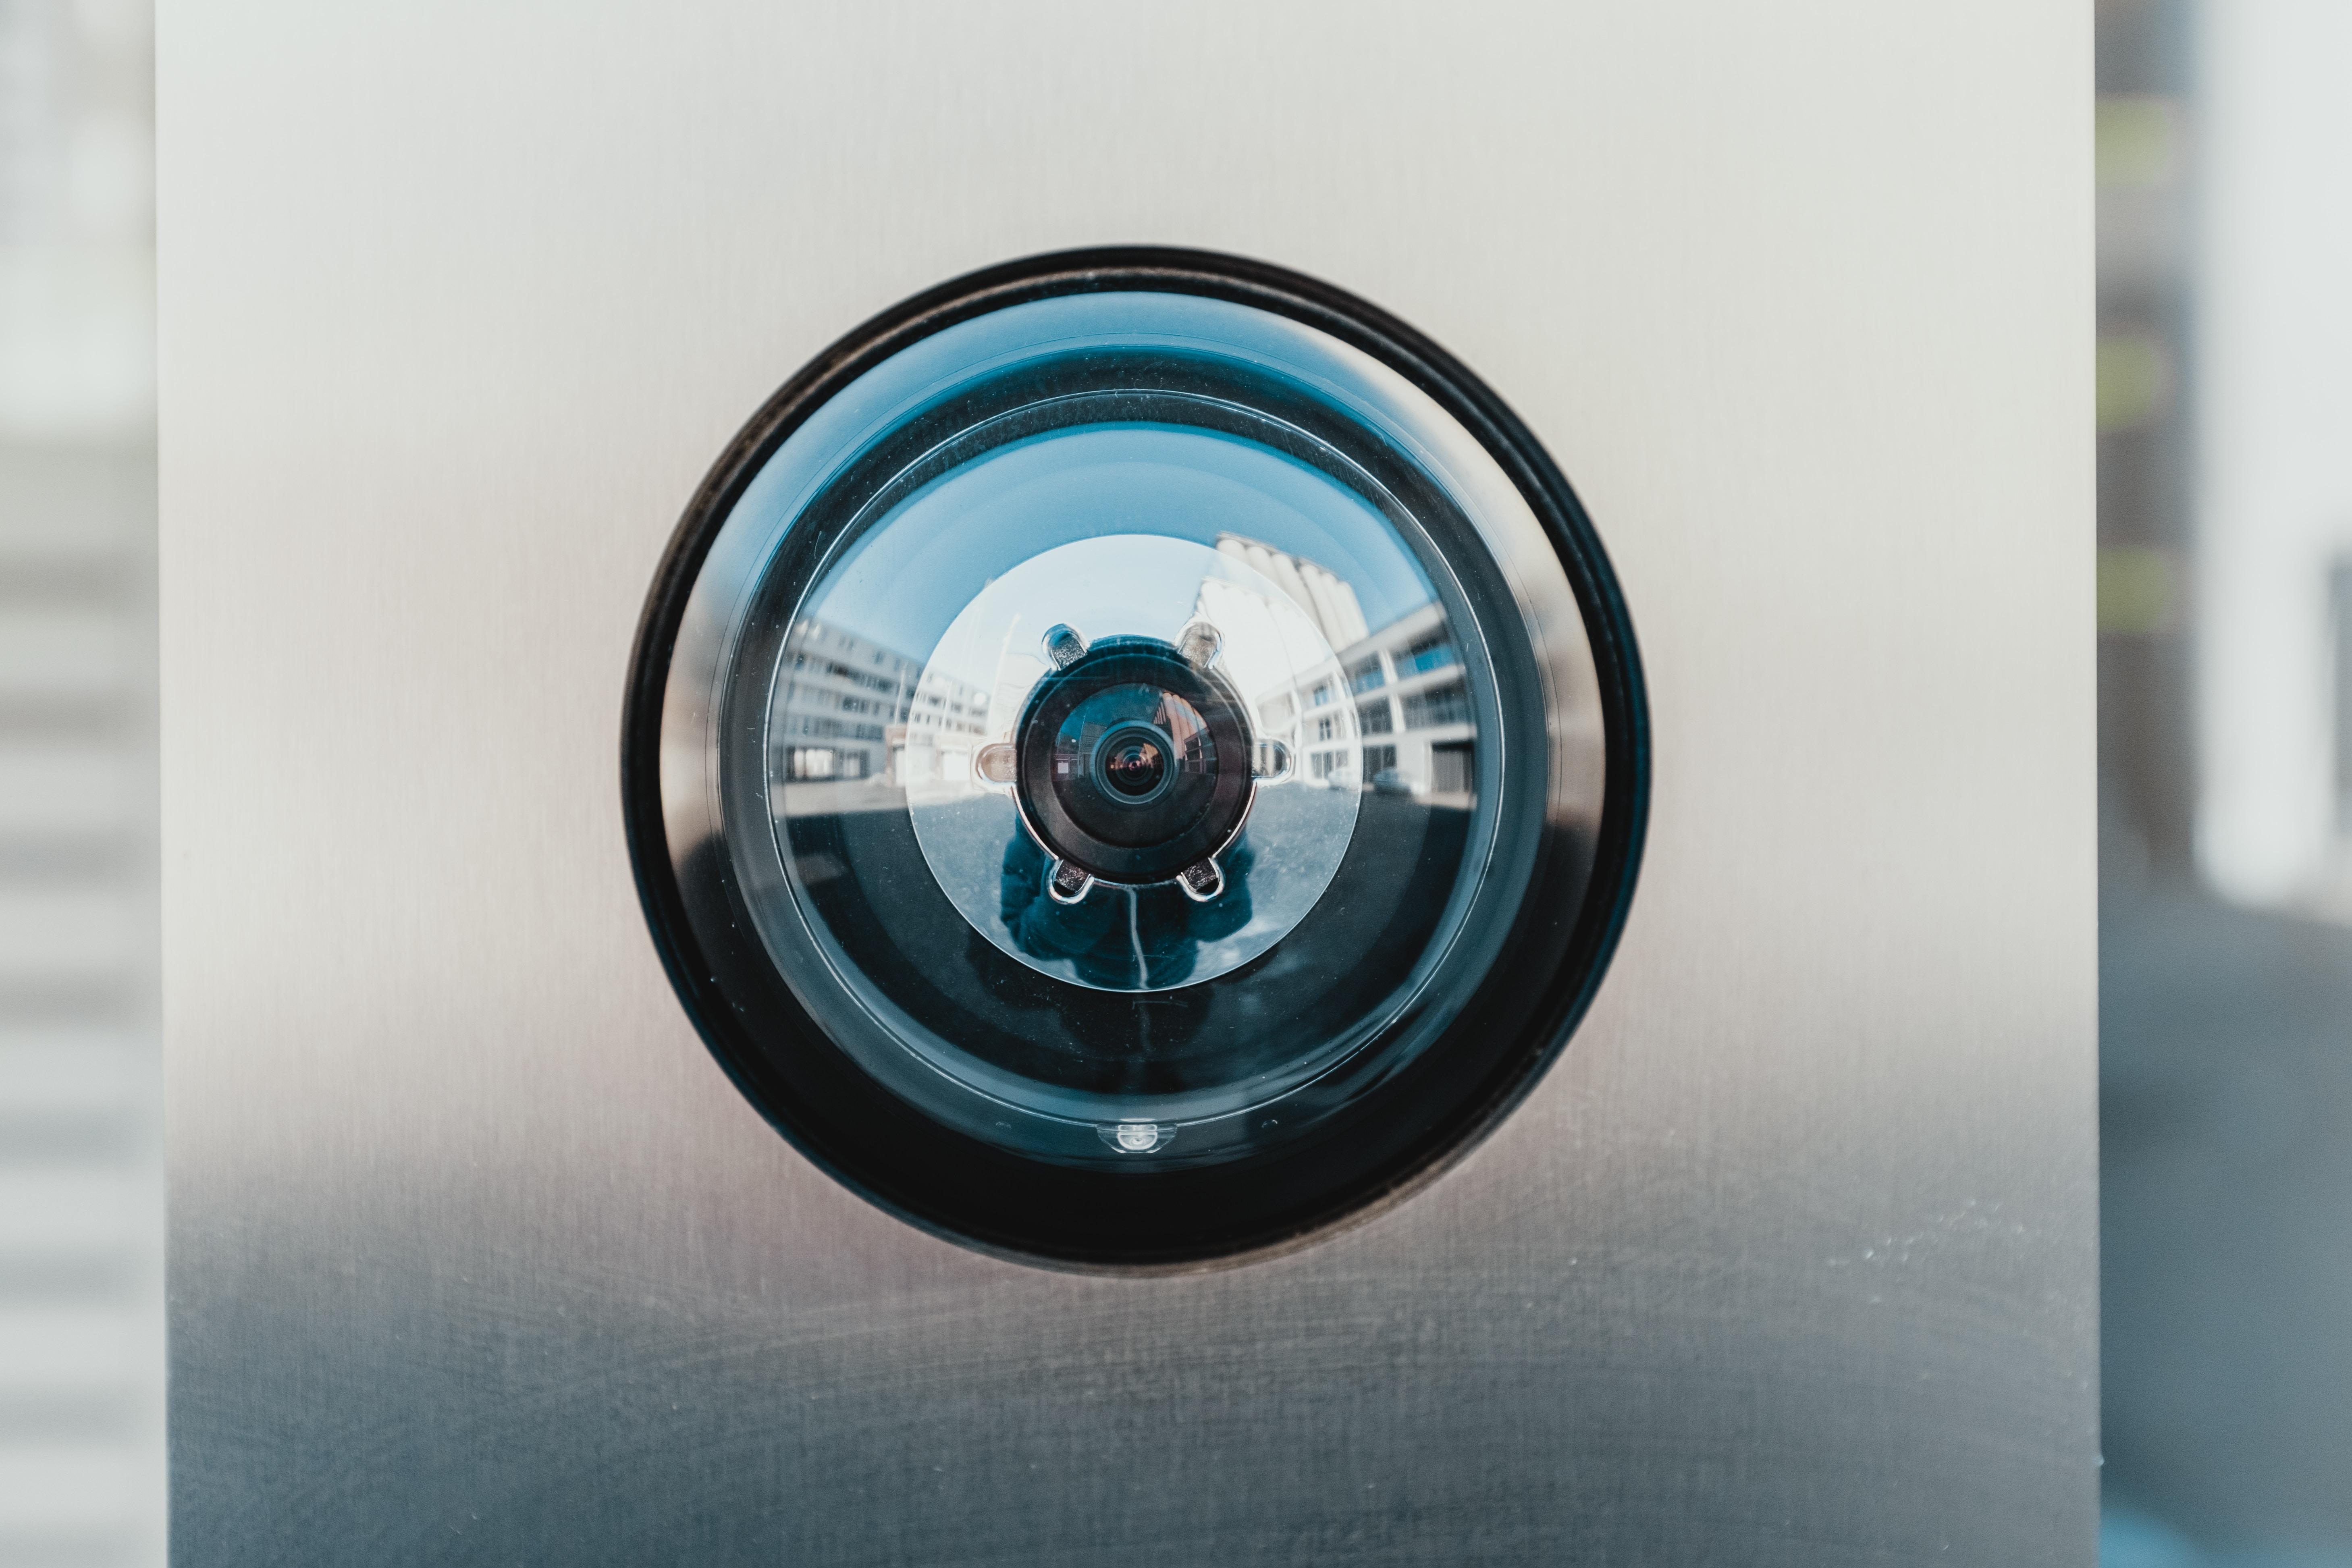 Big Data Companies Need Extra Security